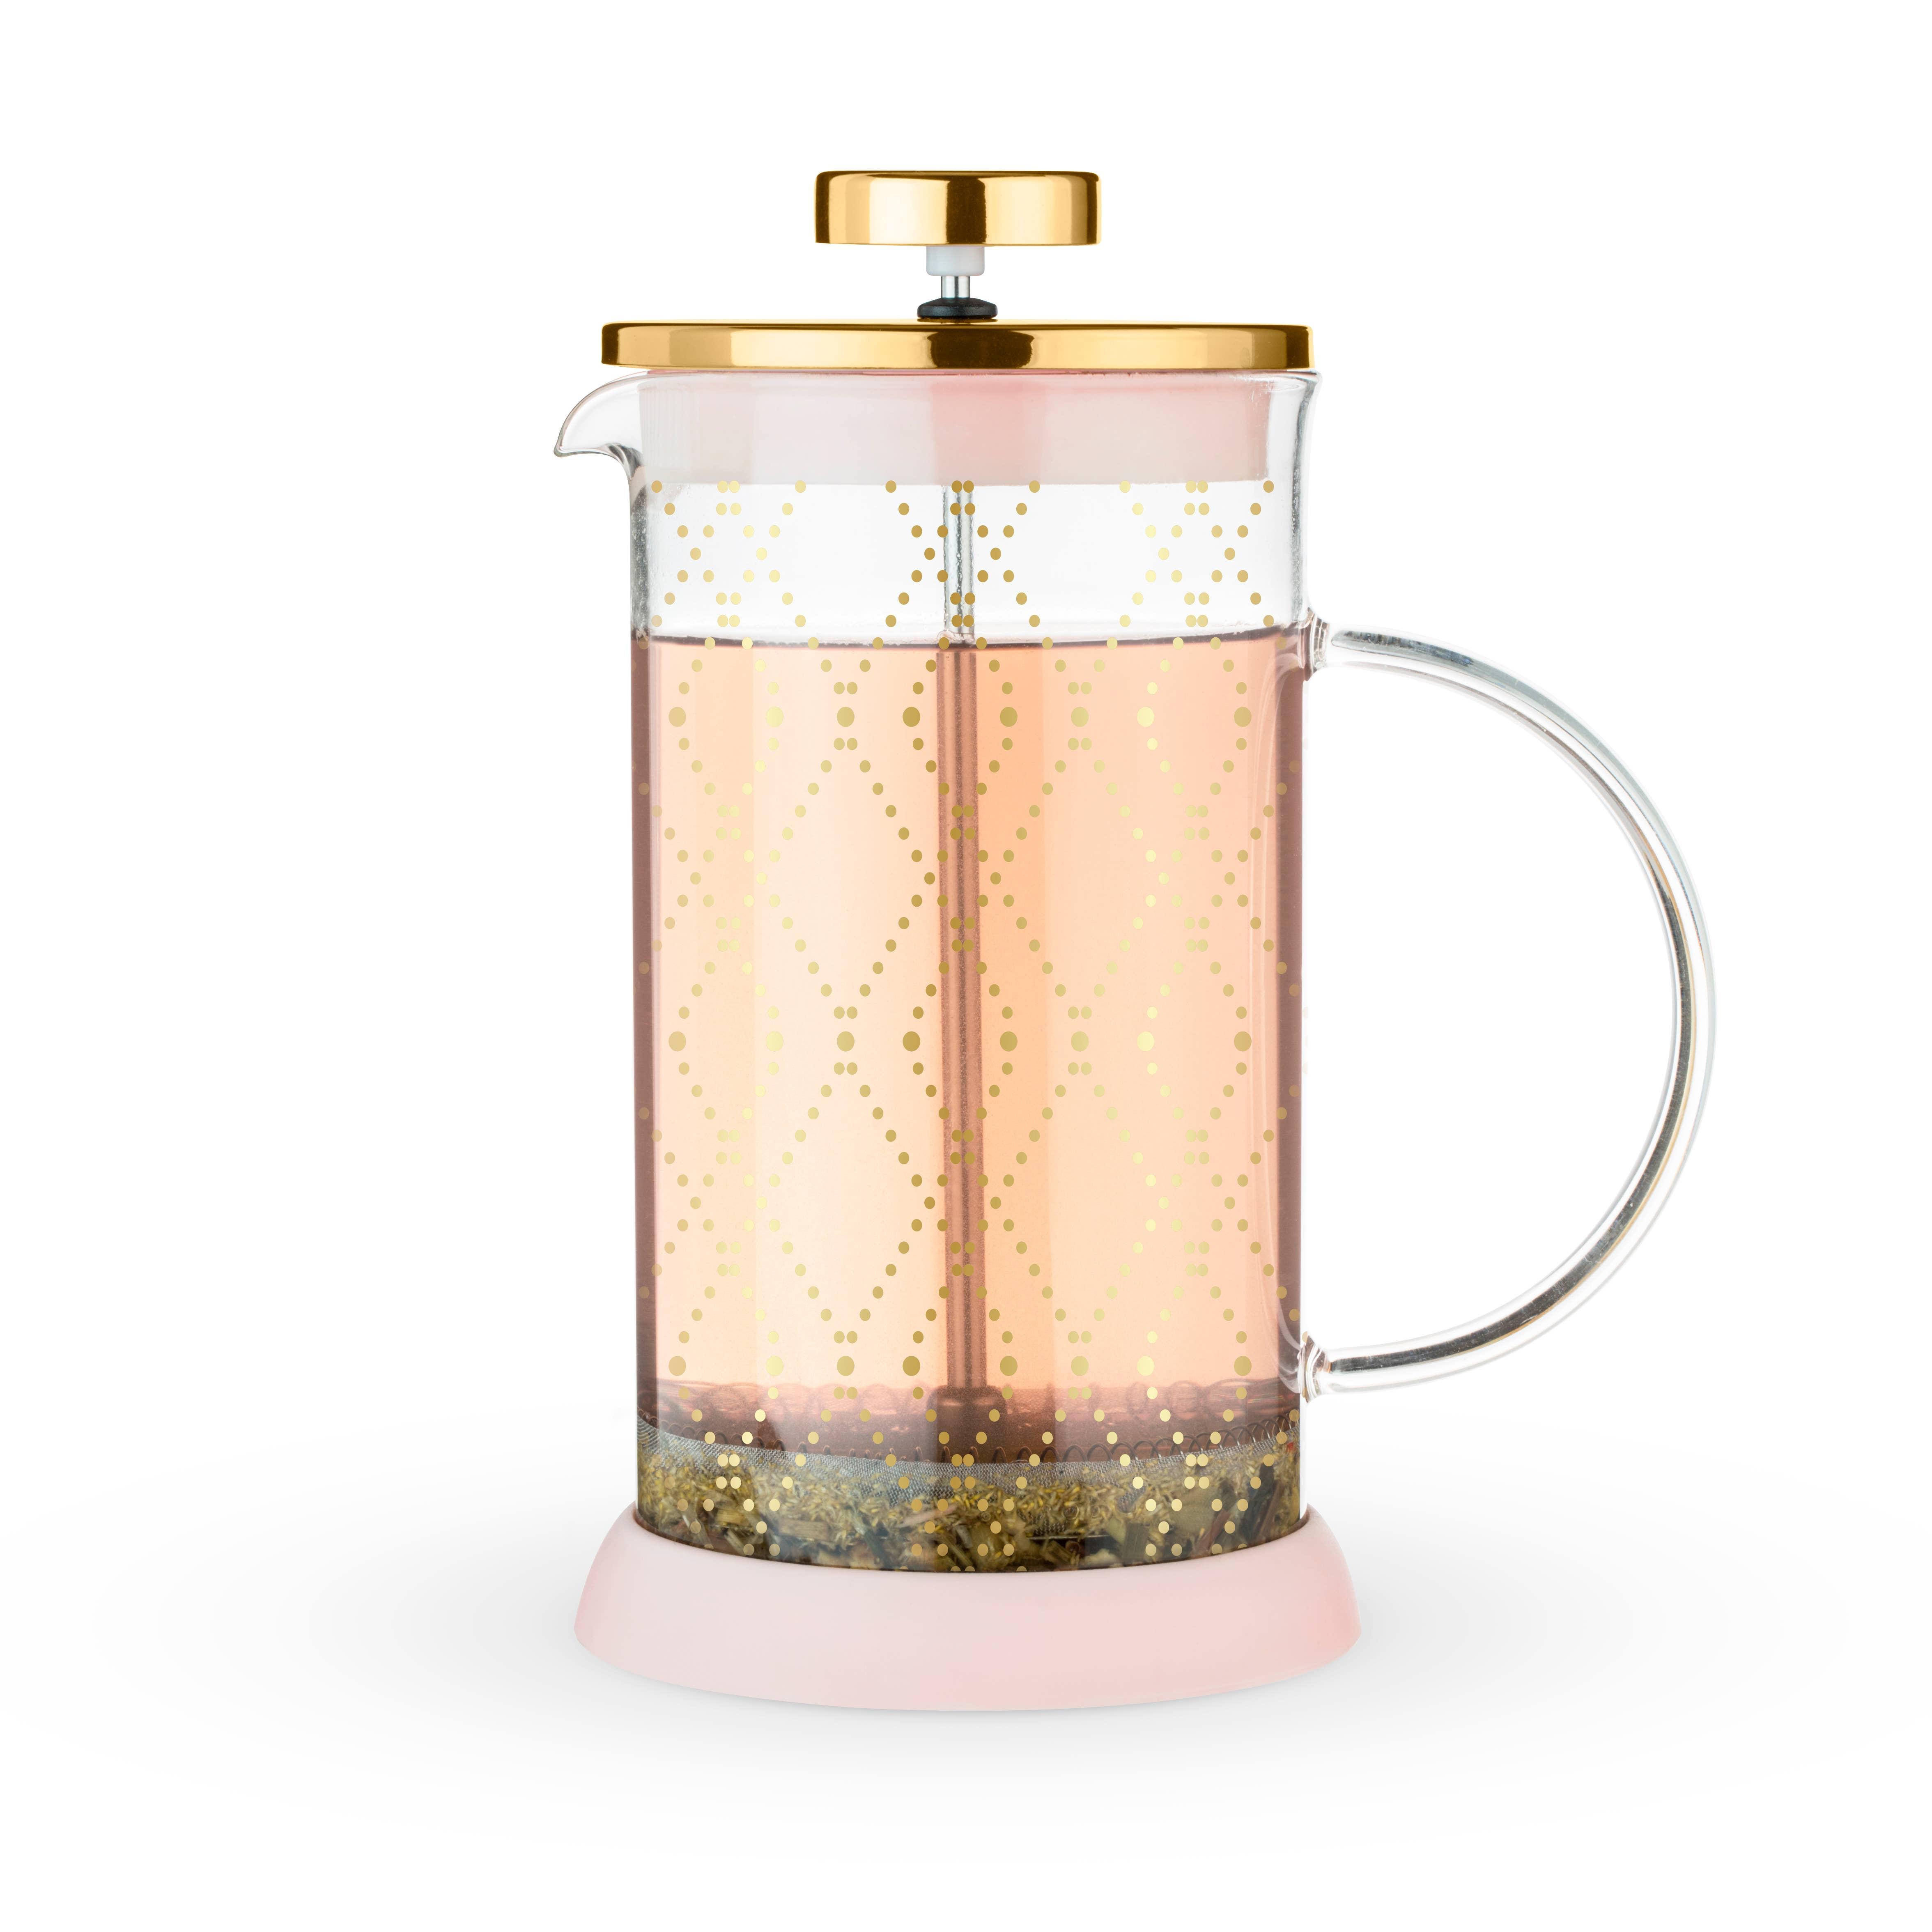 Riley™ Mini Souk Gold Glass Tea Press Pot by Pinky Up®